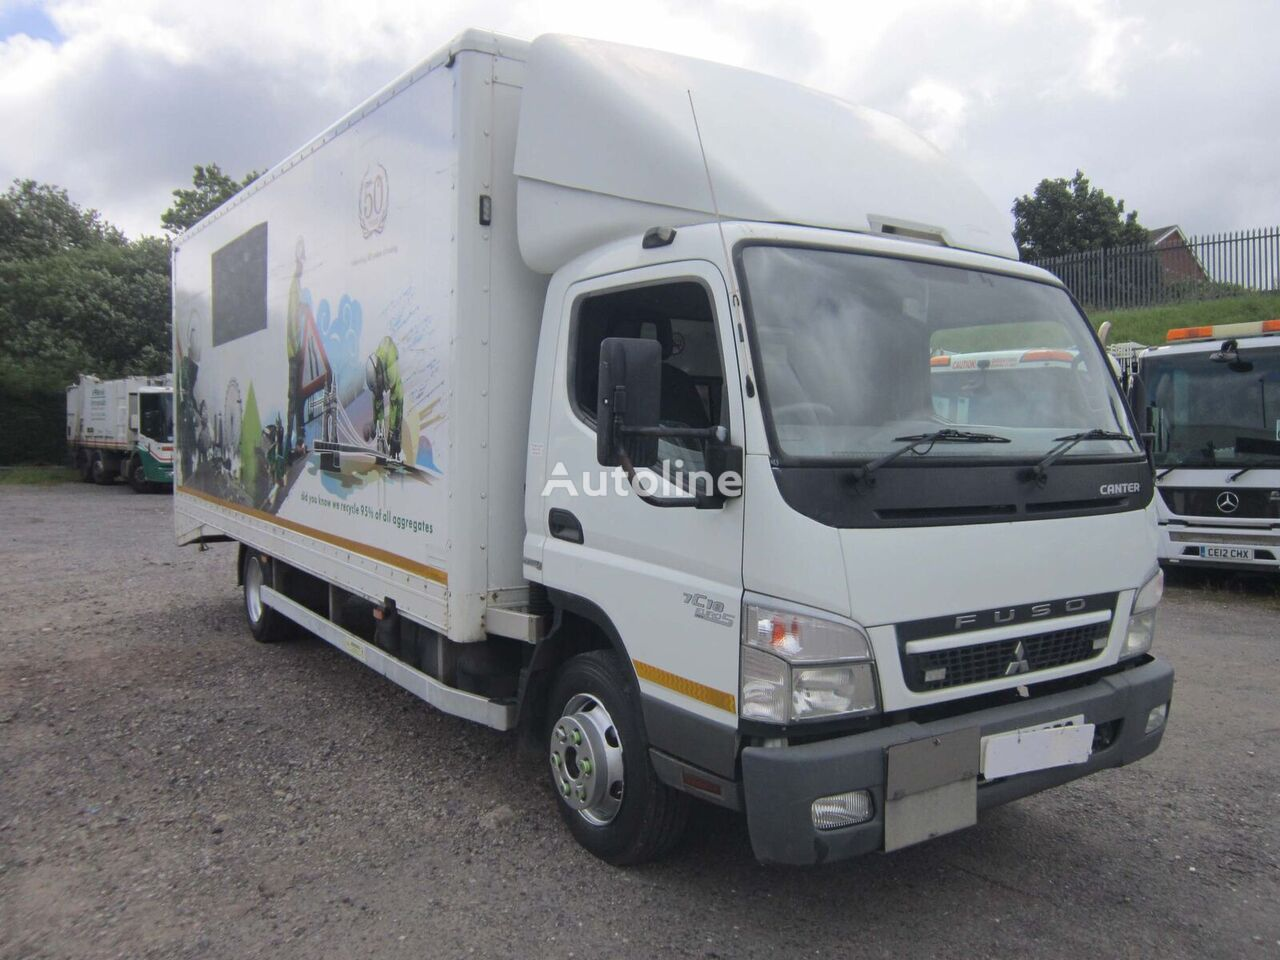 Mitsubishi Fuso CANTER 7C18 4X2 7.5TON BOX VAN C/W ROLLER SHUTTER DOORS camión furgón